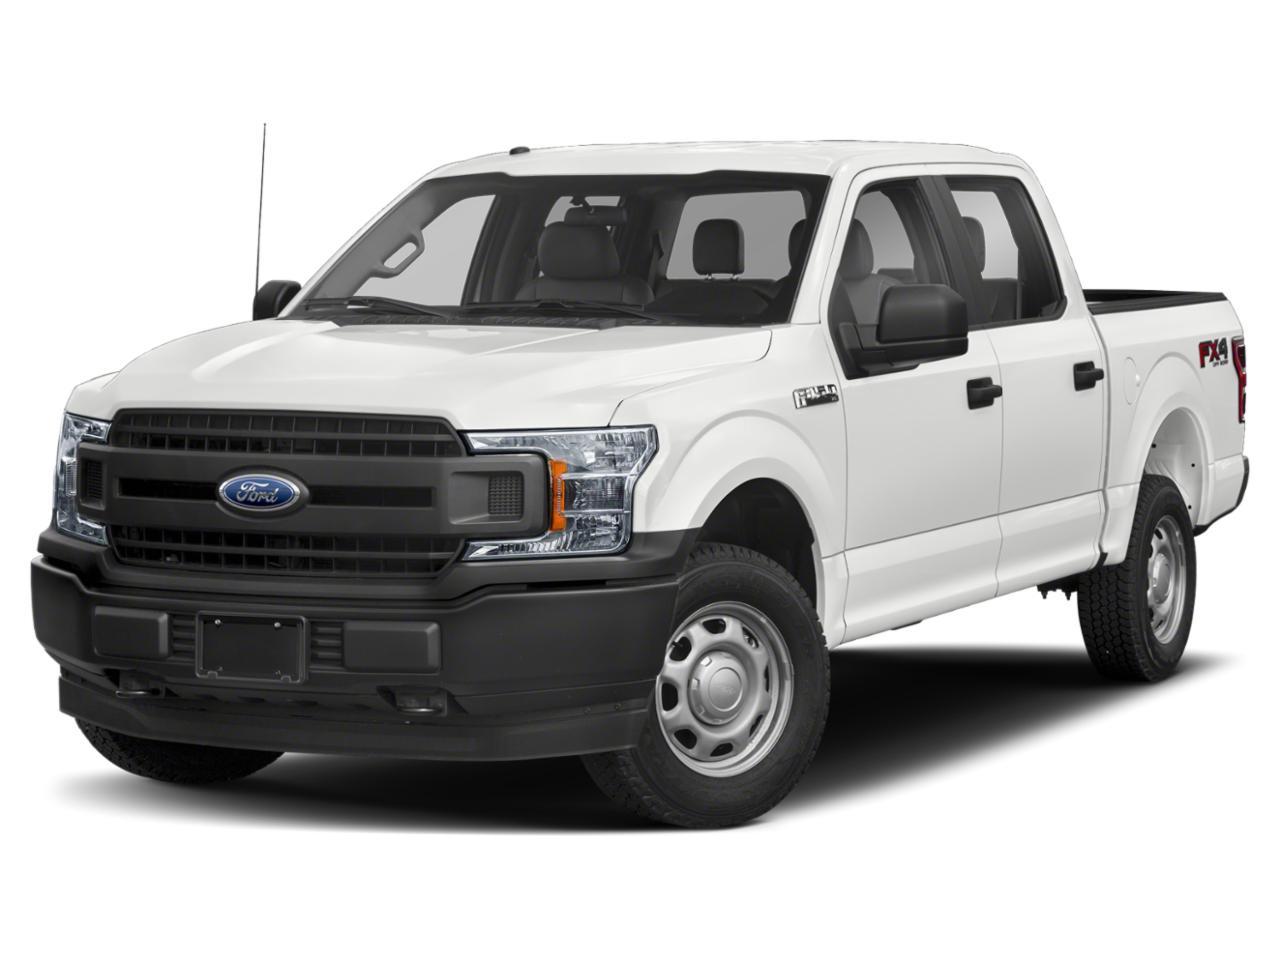 Oxford White 2020 Ford F-150 XL 4x4 XL 4dr SuperCrew 5.5 ft. SB New Bern NC